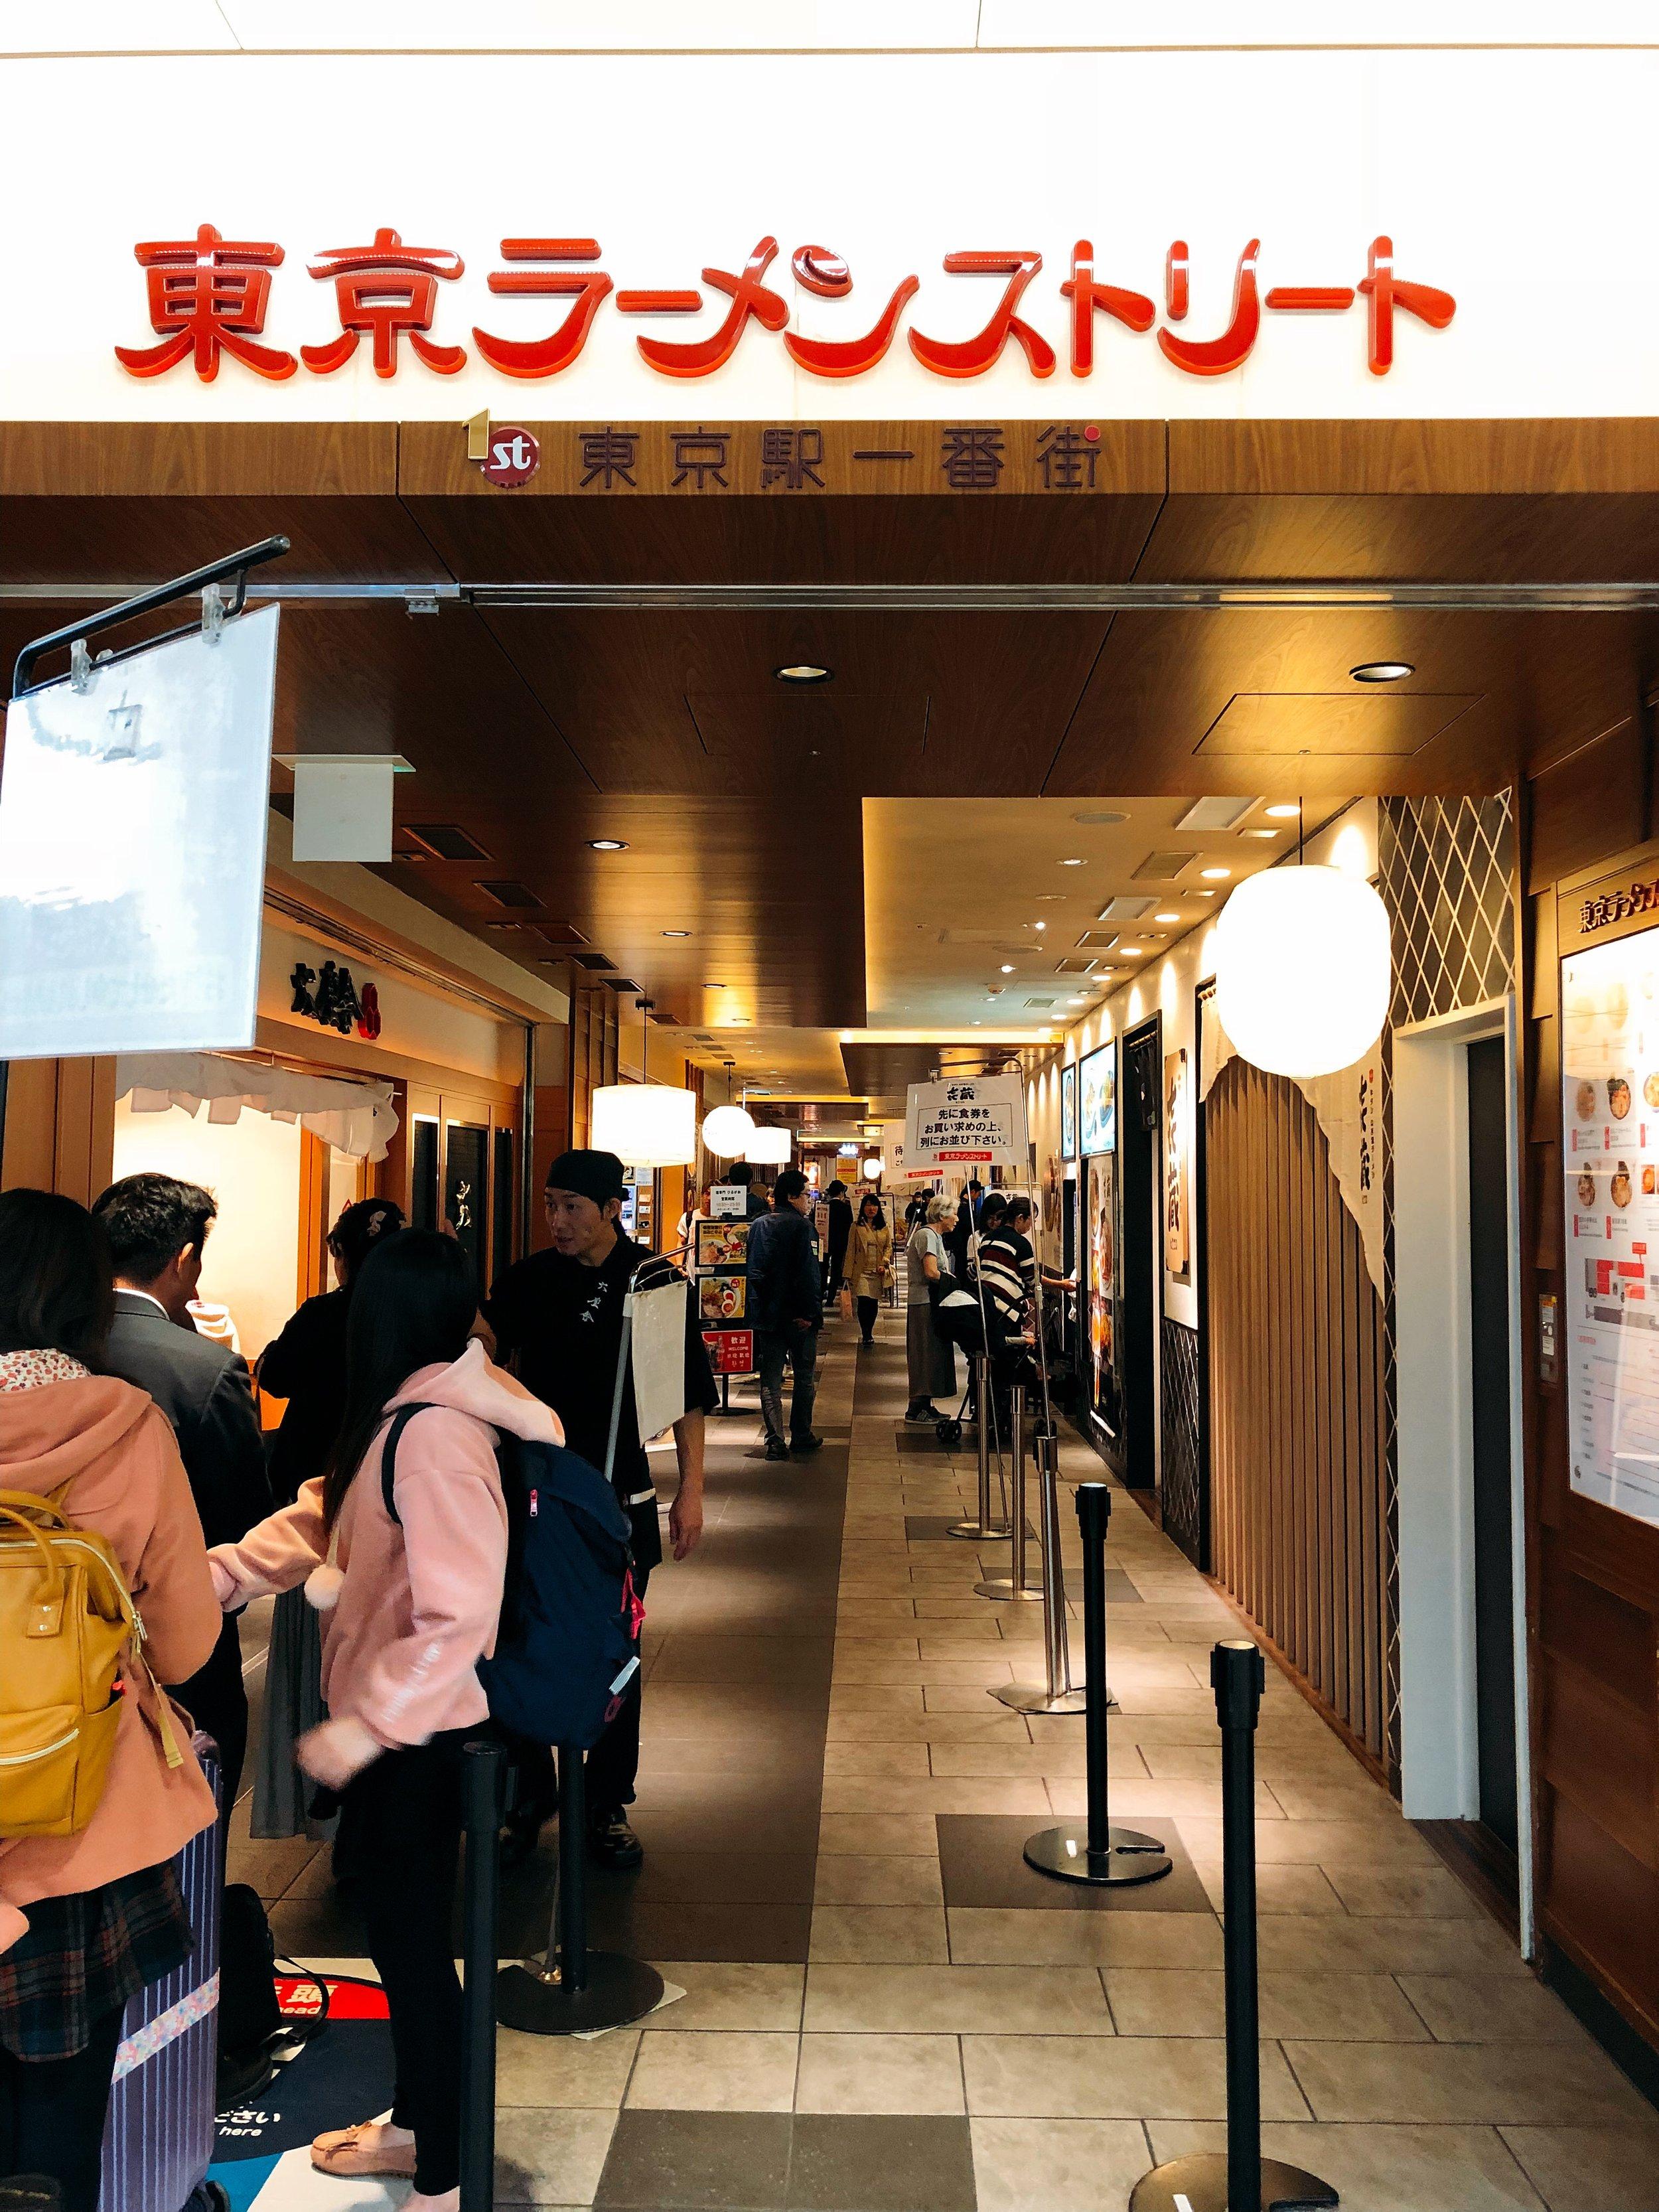 The Entrance To Ramen Street And Rokurinsha